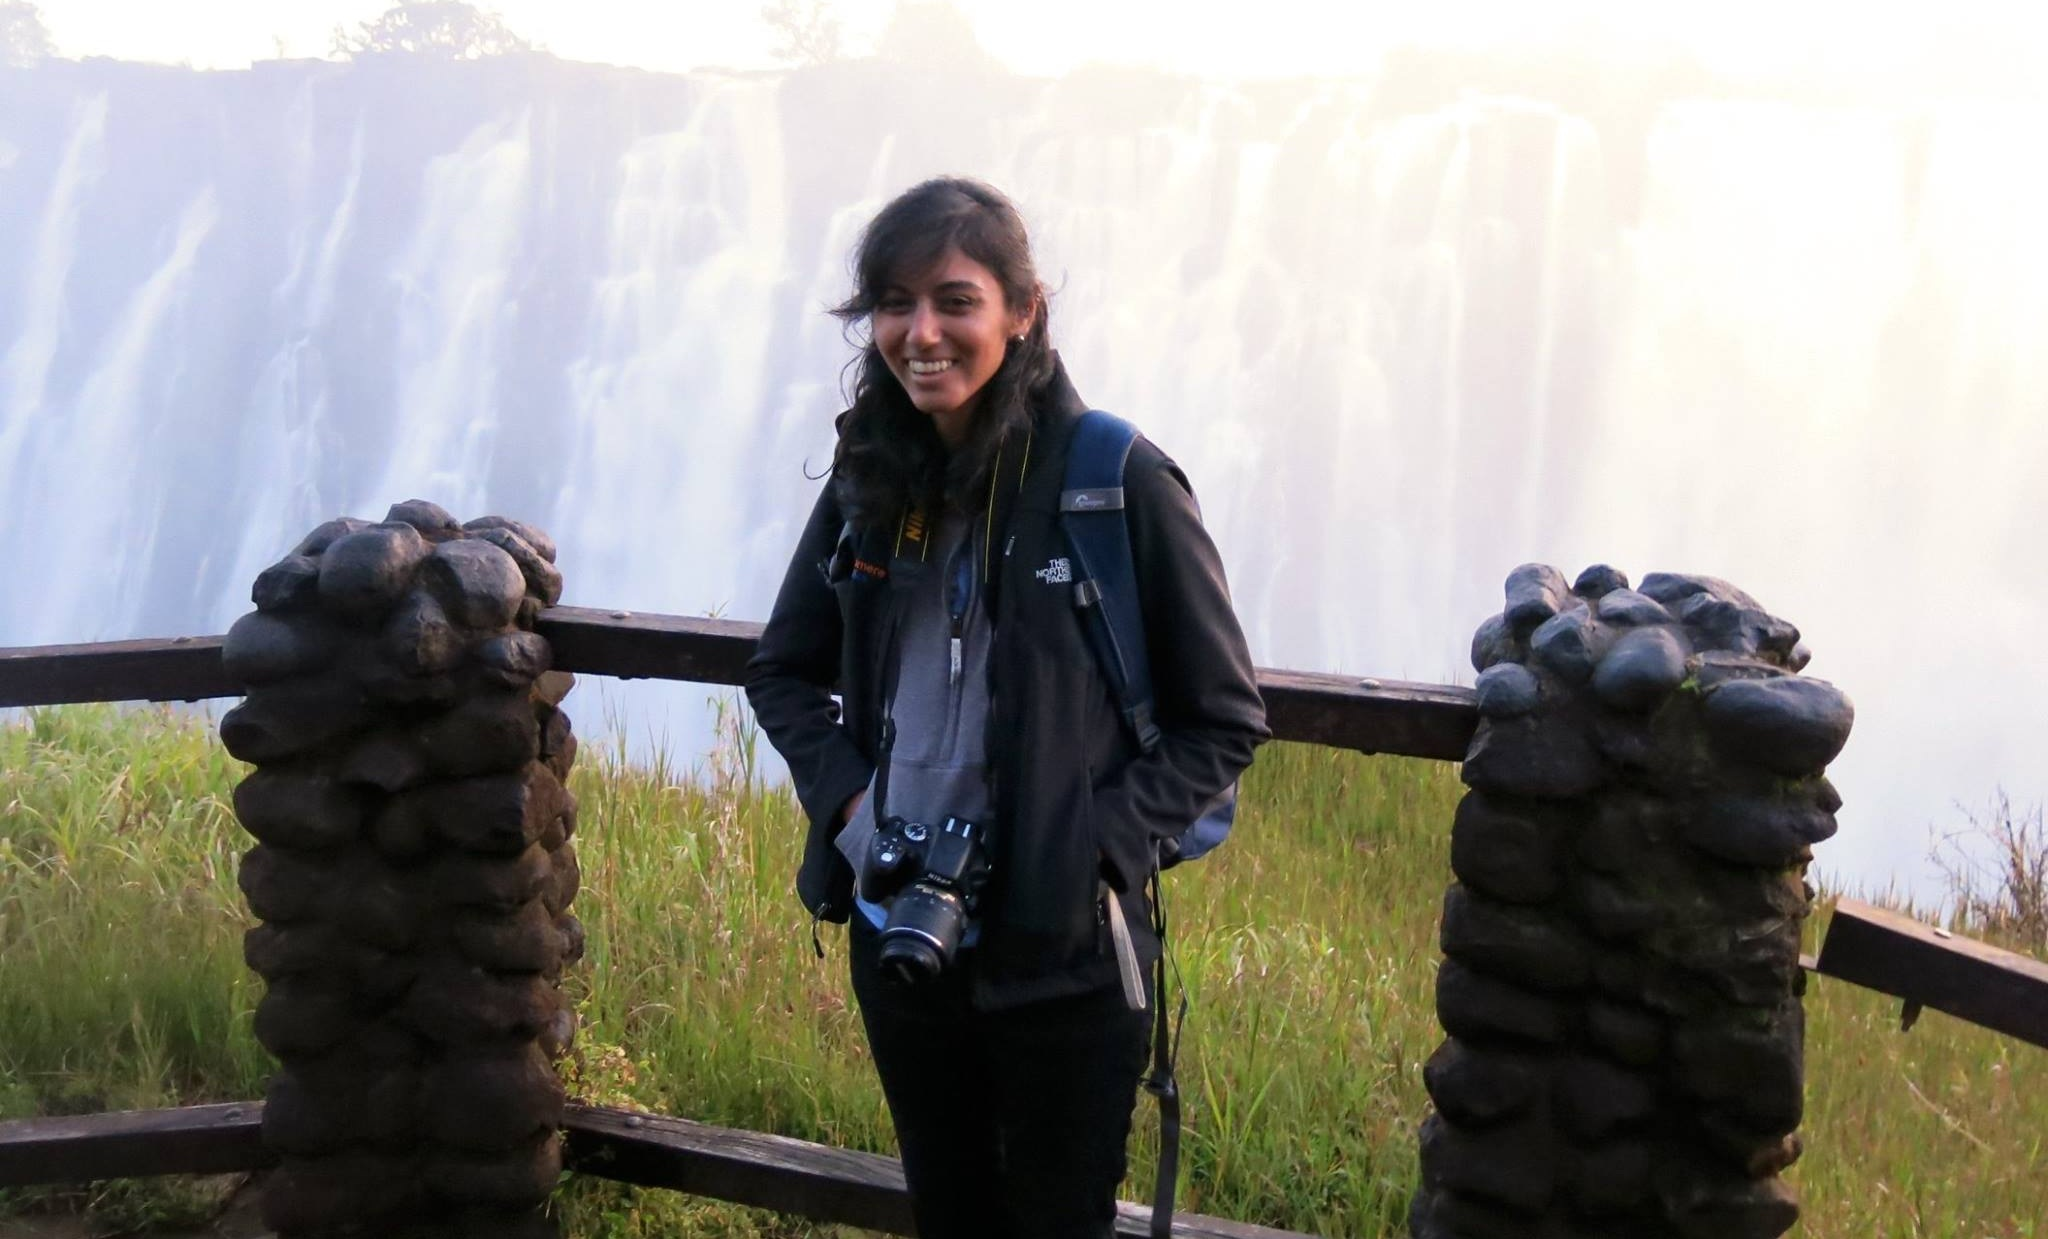 Mauna in front of Victoria Falls, Zambia